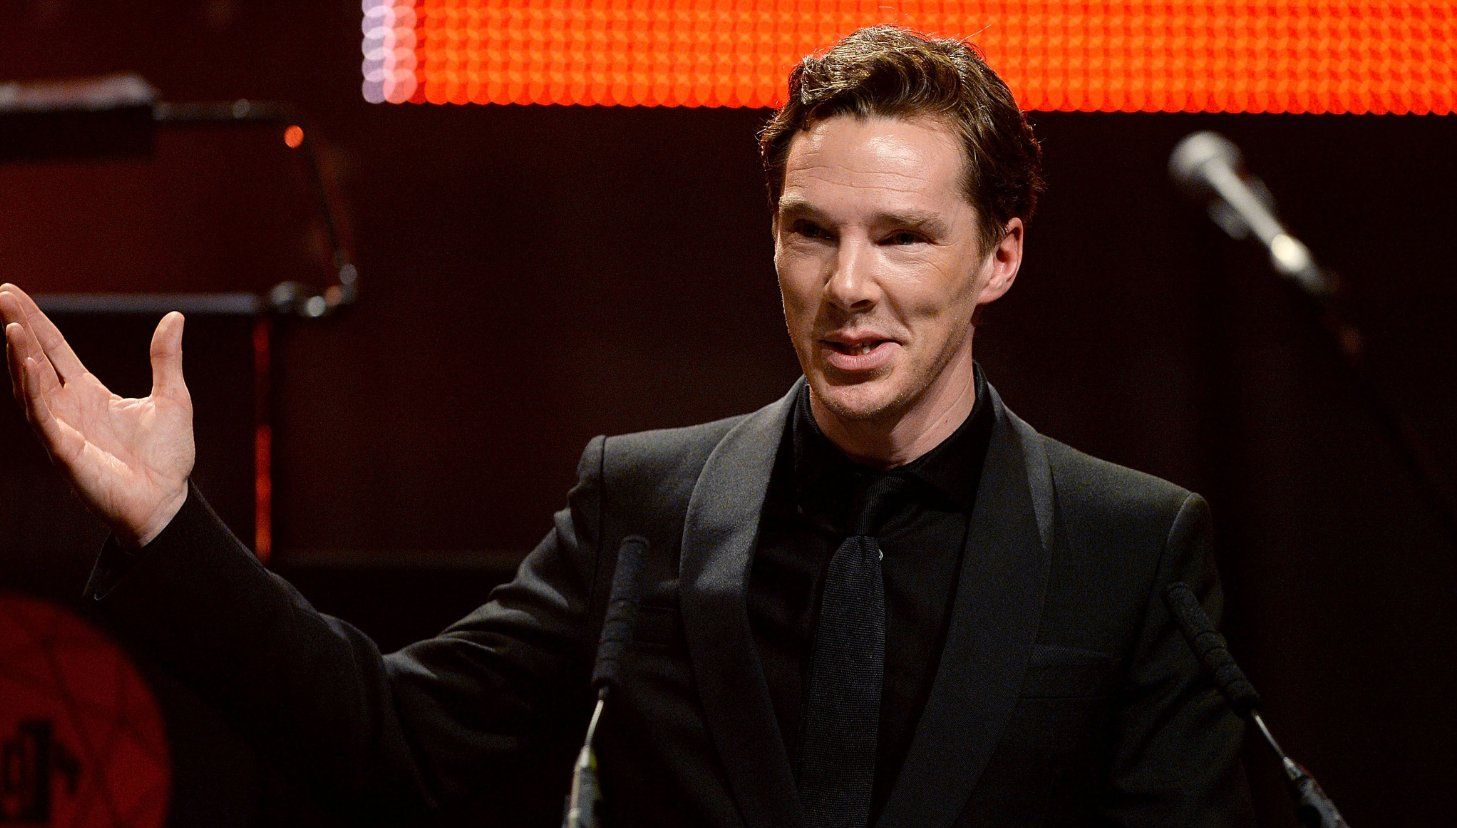 Watch Benedict Cumberbatch (born 1976) video